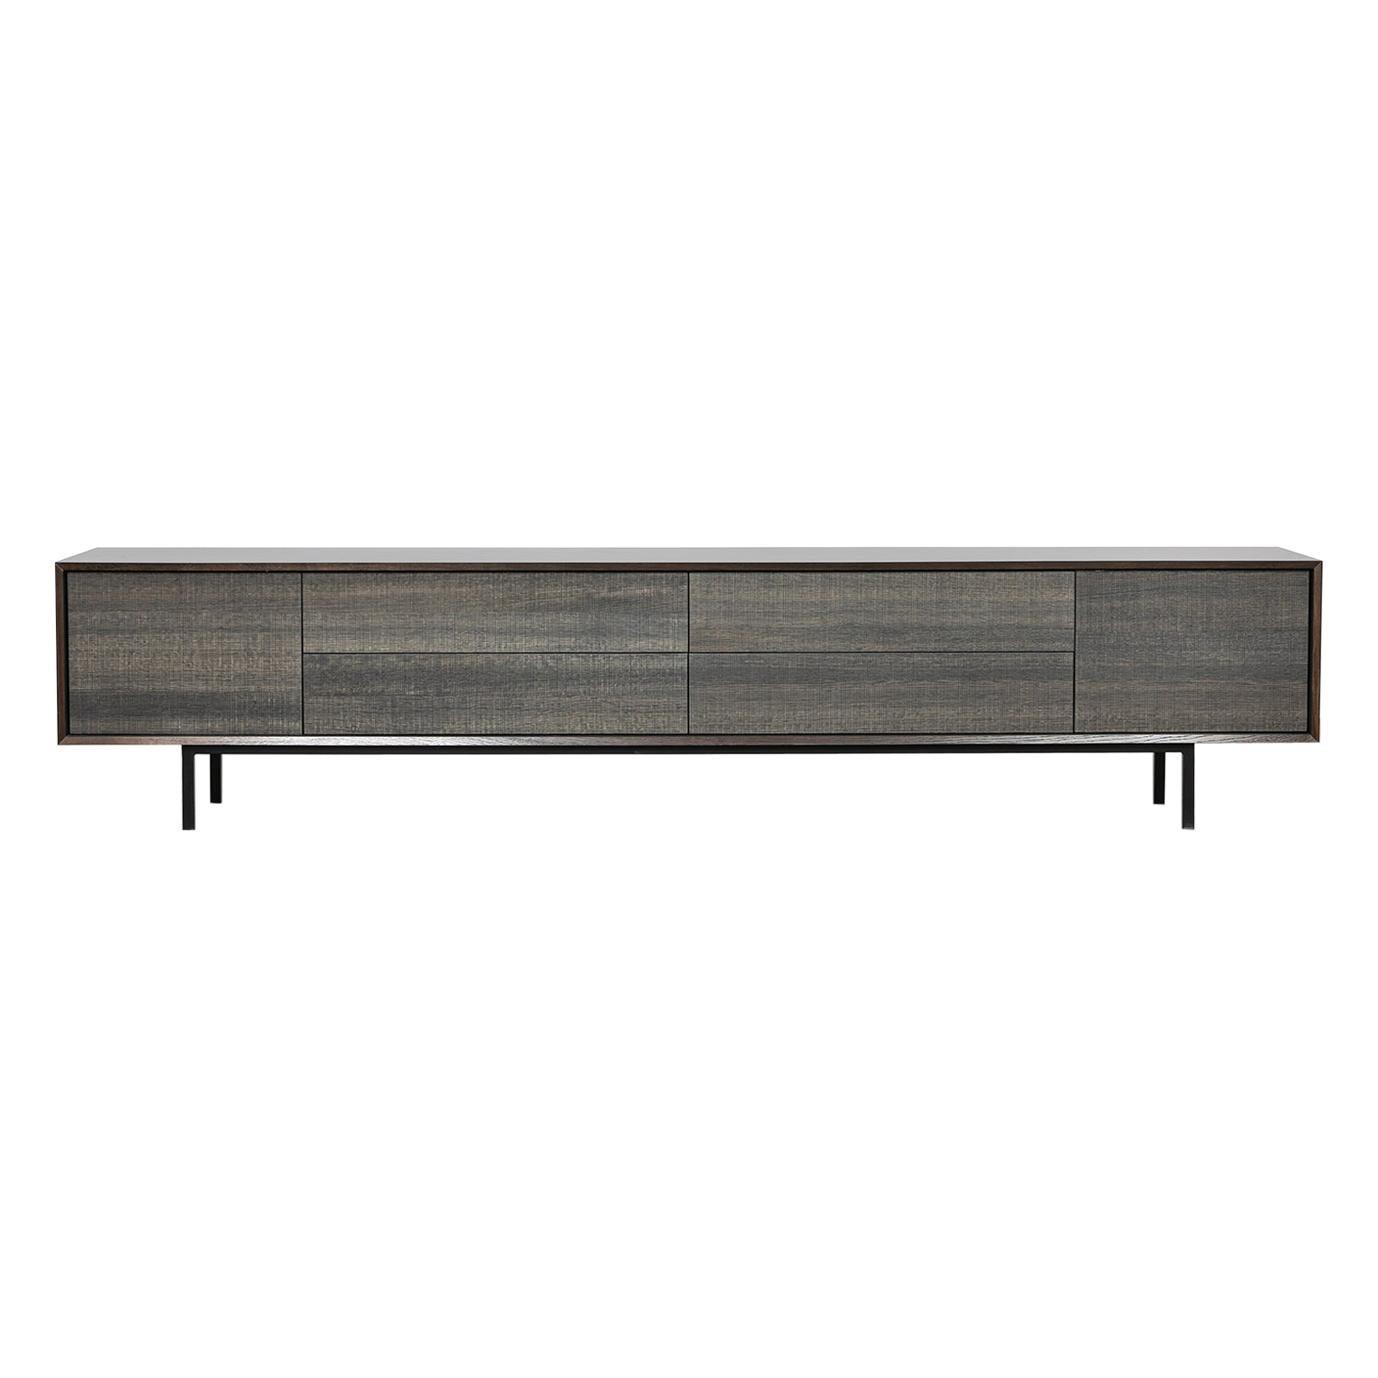 Contemporary Smoked Oak Sideboard by Johannes Hock